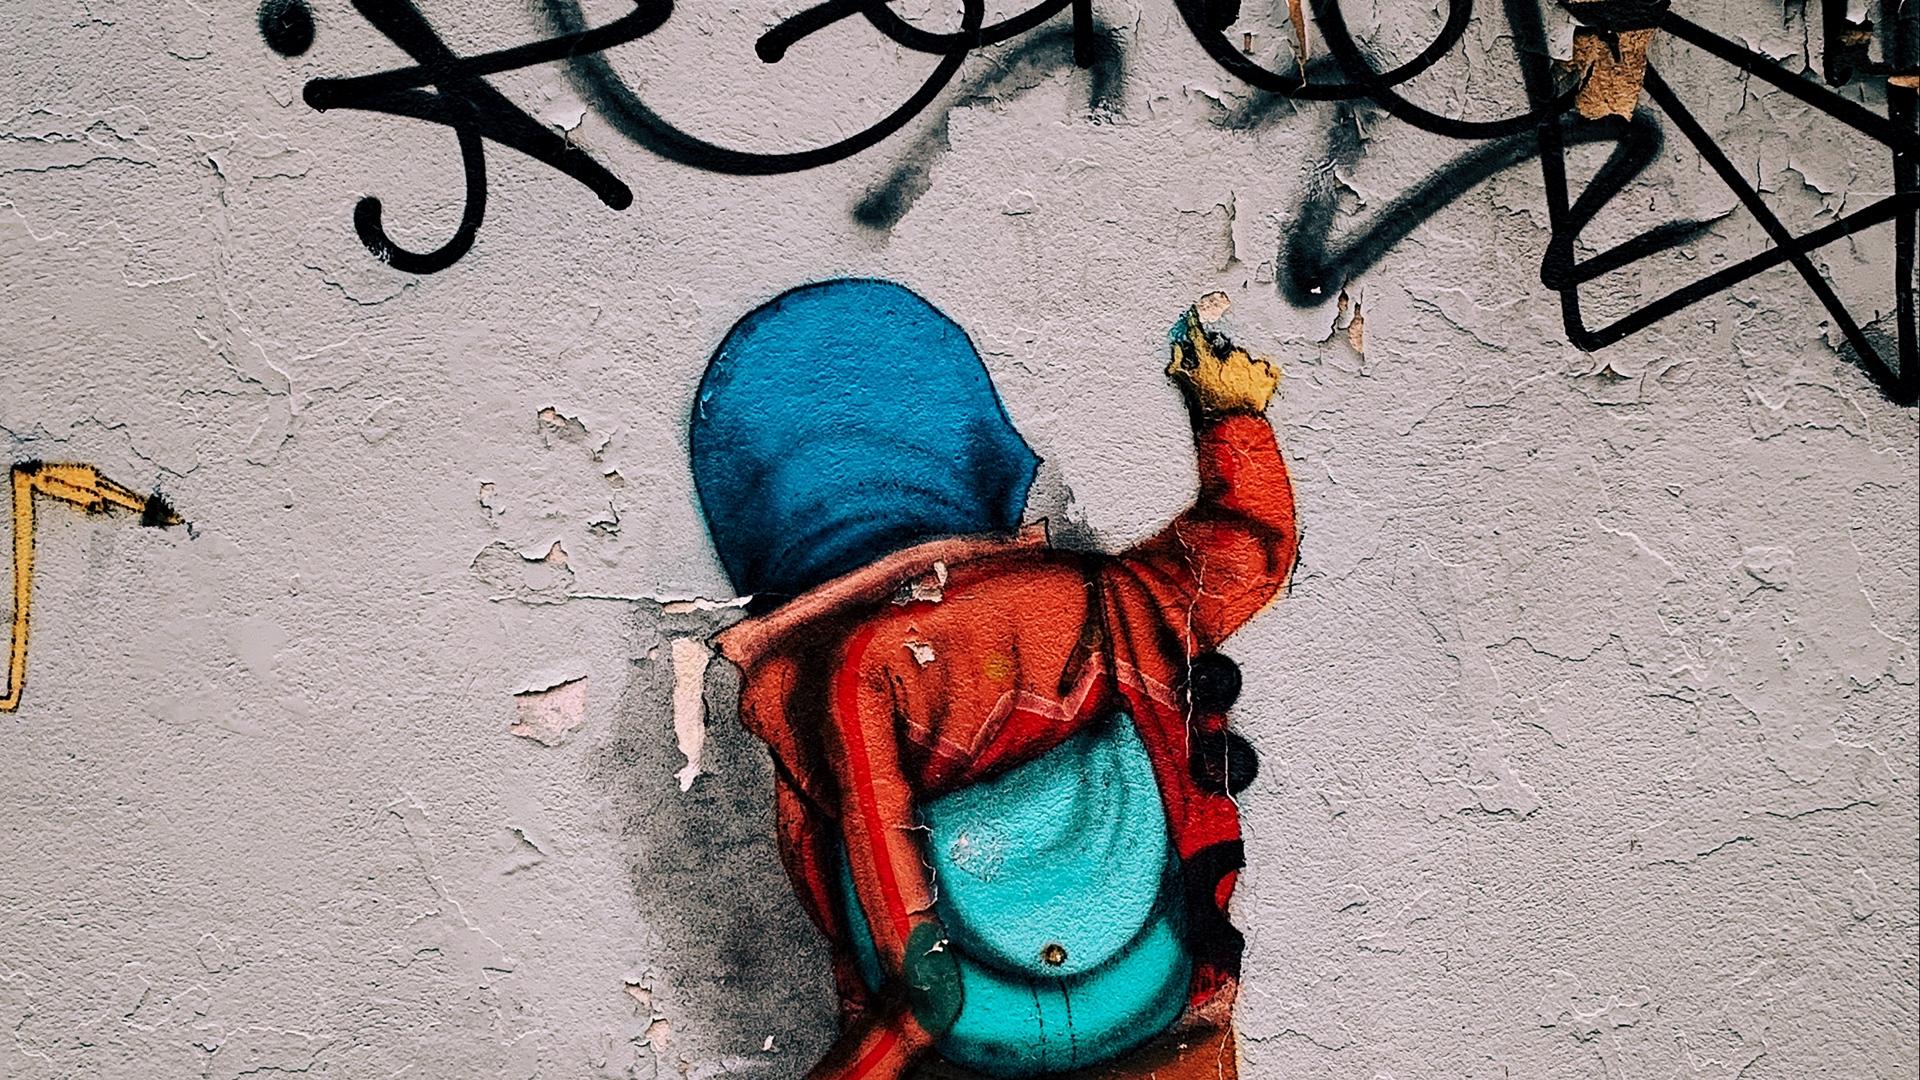 images of graffiti art